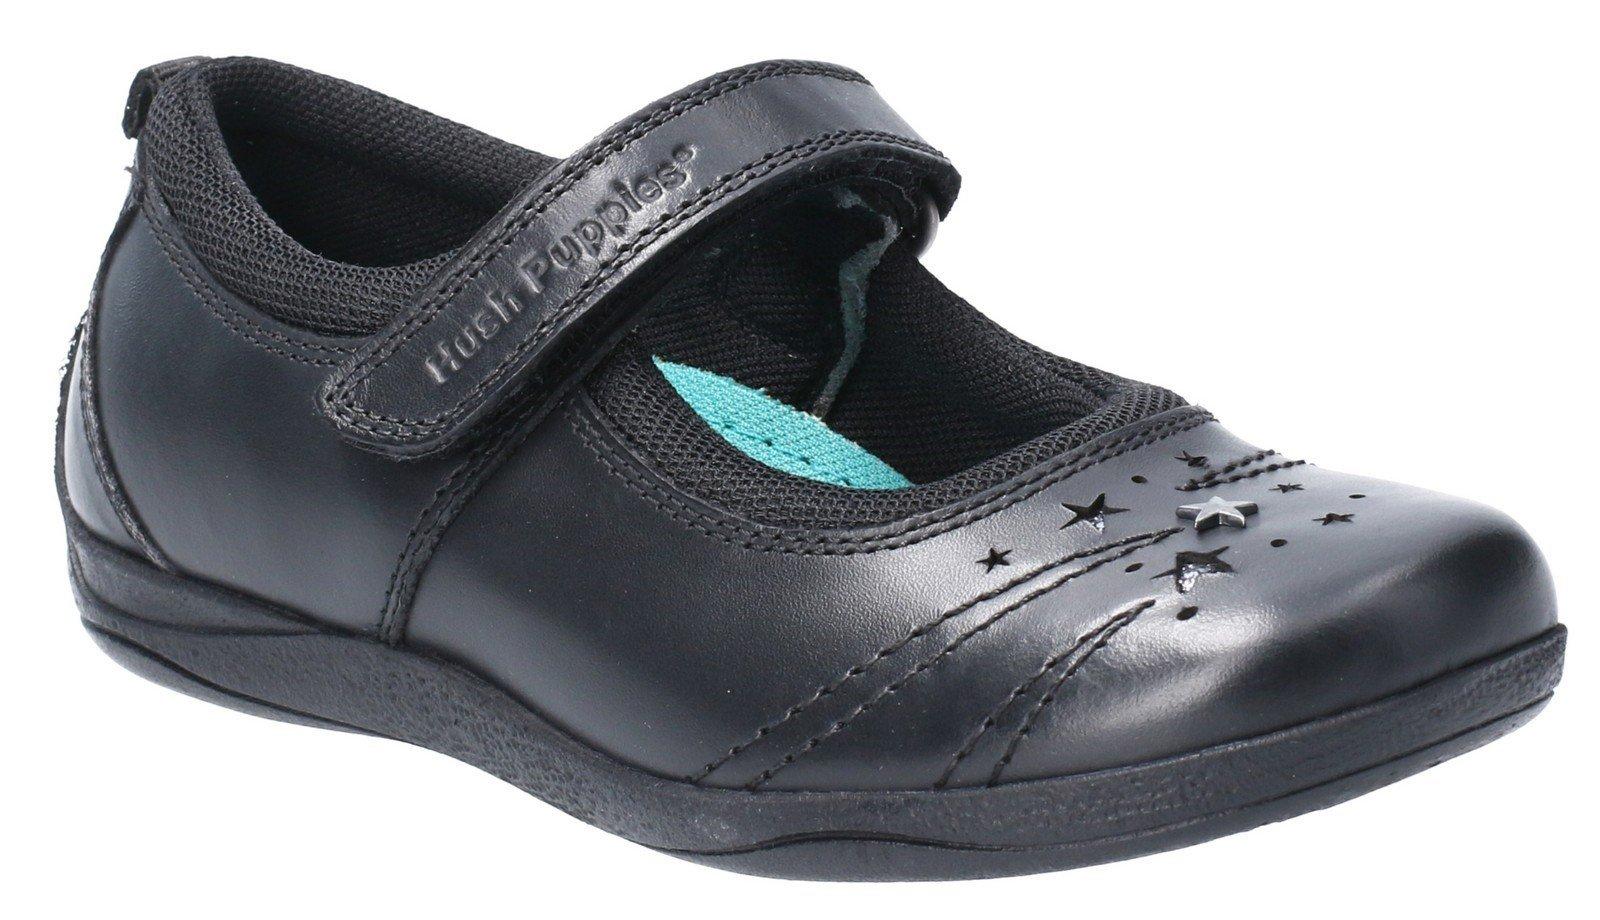 Hush Puppies Kid's Amber Snr Touch Fastening School Shoe Black 28980 - Black 3 UK